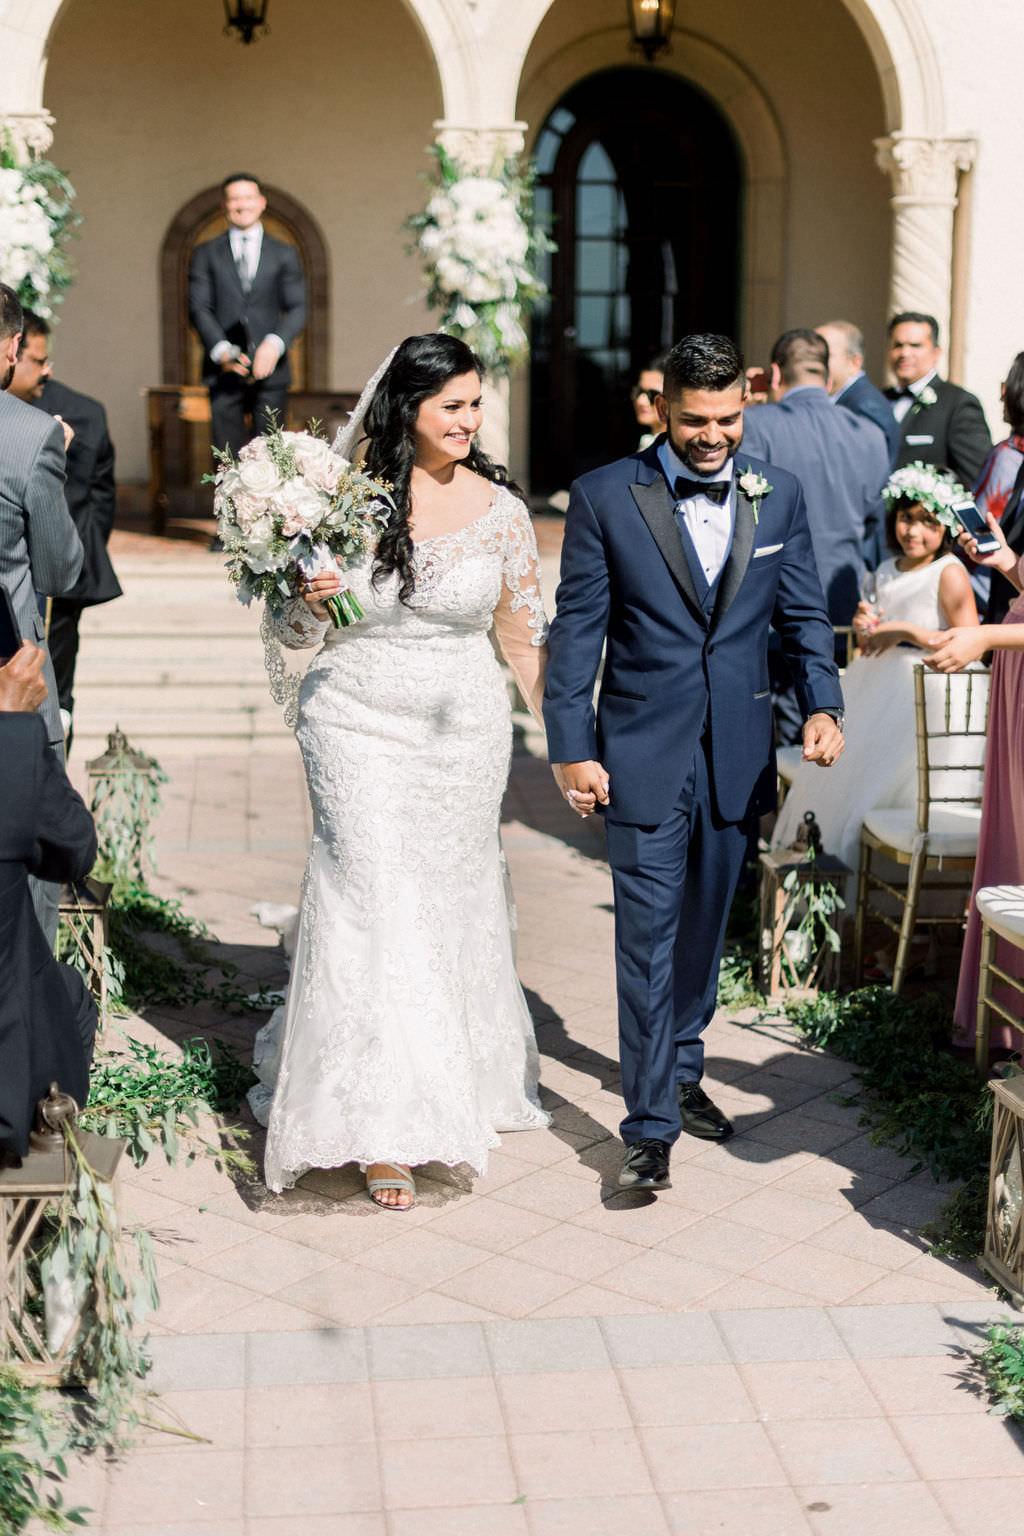 Indian Florida Bride and Groom Just Married, Wedding Processional, Elegant Outdoor Wedding Ceremony | Sarasota Wedding Planner Laura Detwiler Events